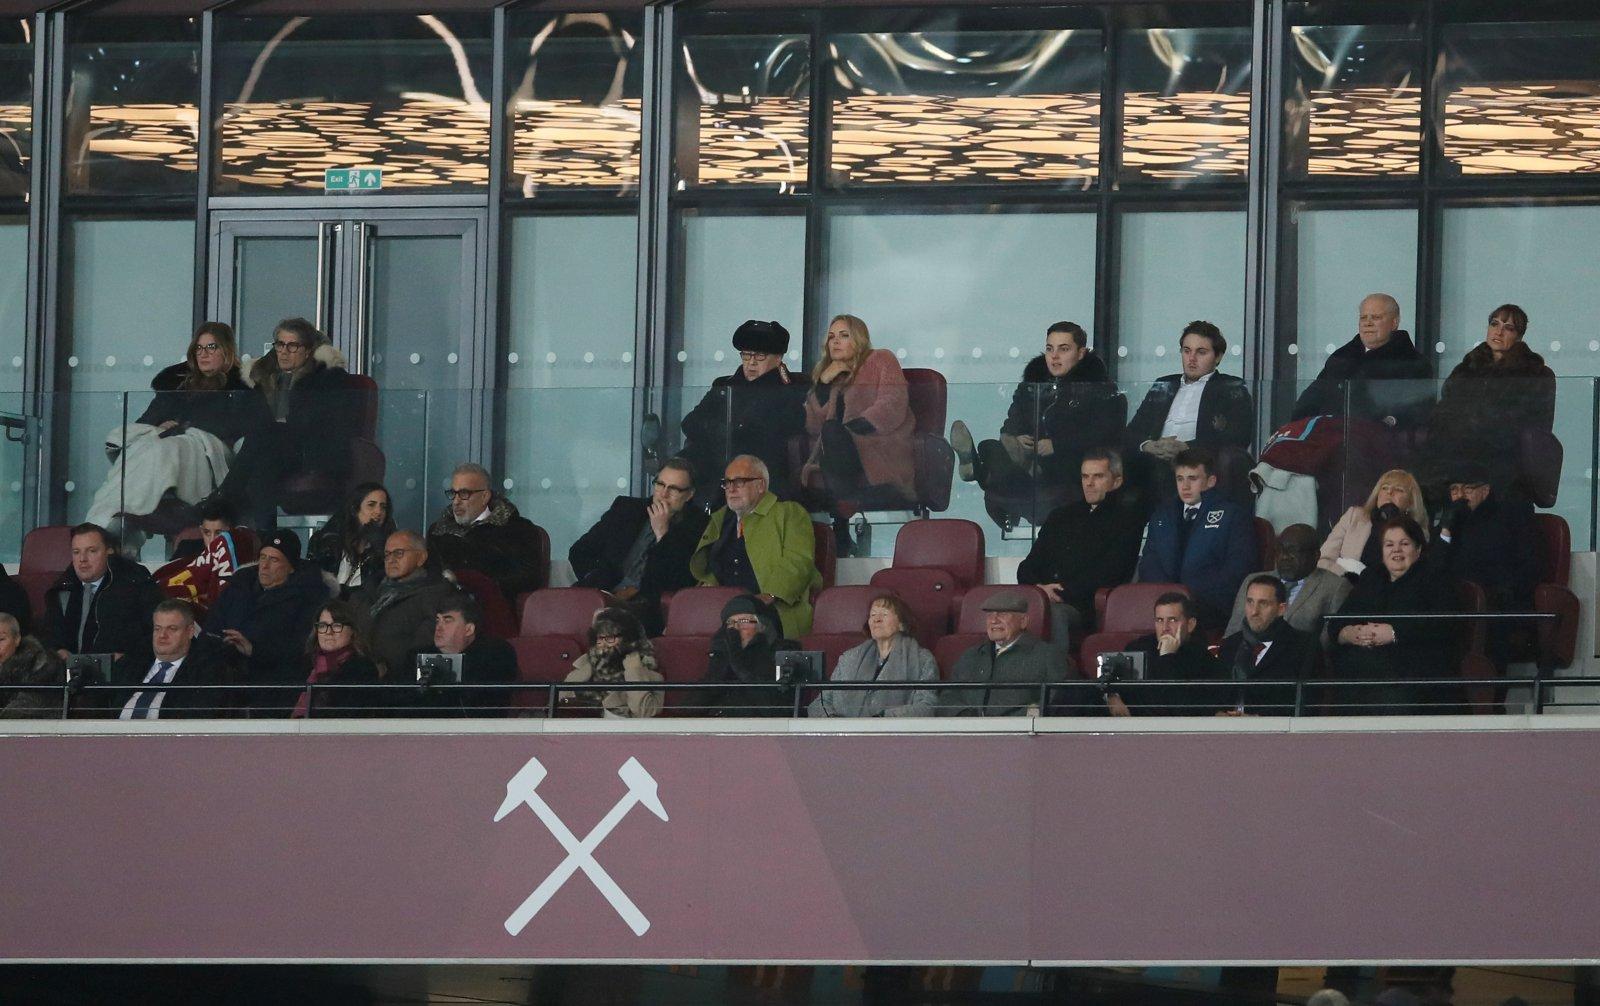 Image for West Ham fans react to Jacqueline Gold Twitter mishap